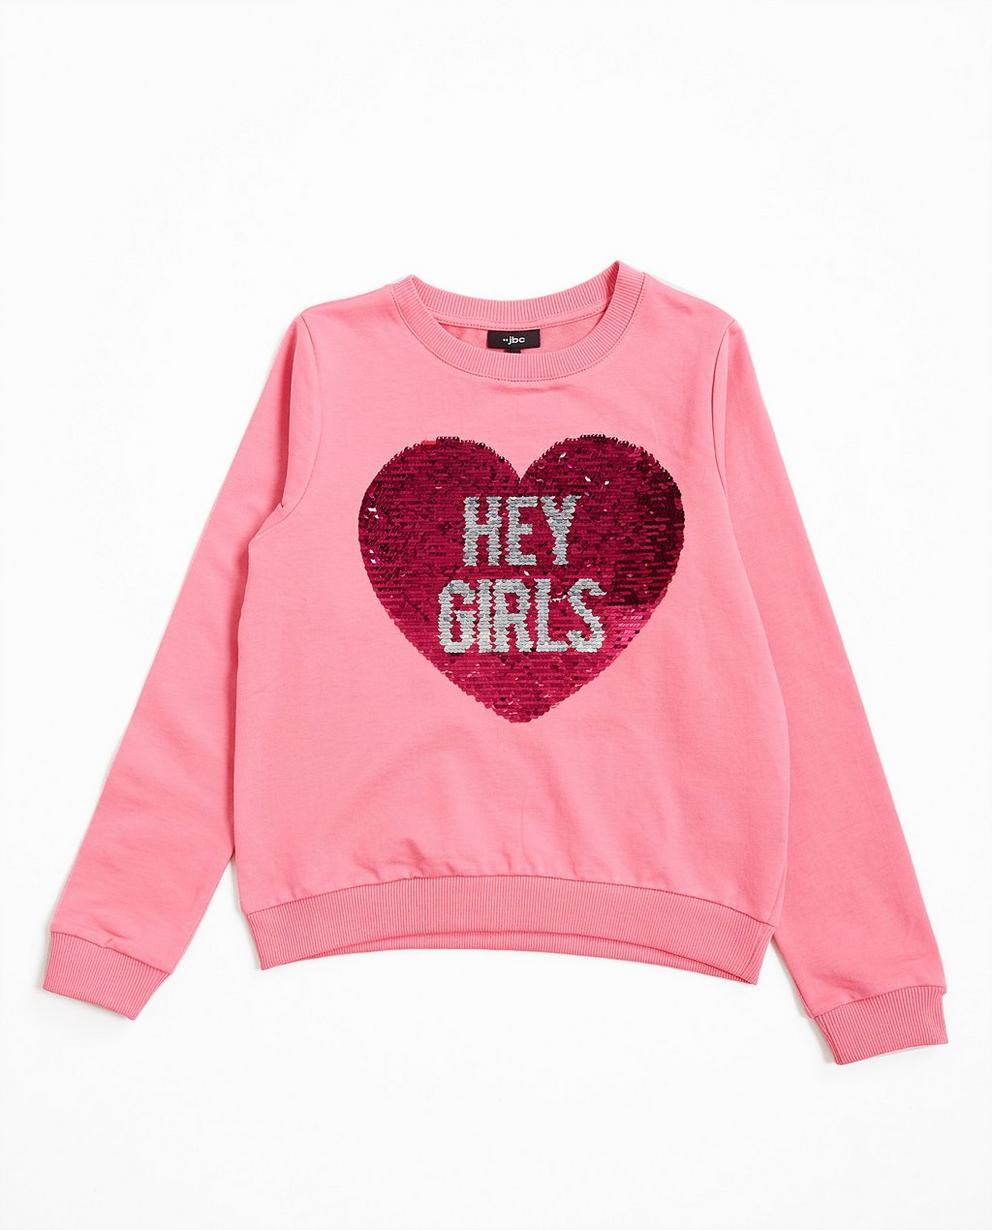 Hellrosa Swipe-Sweater - mit Pailletenherz - JBC